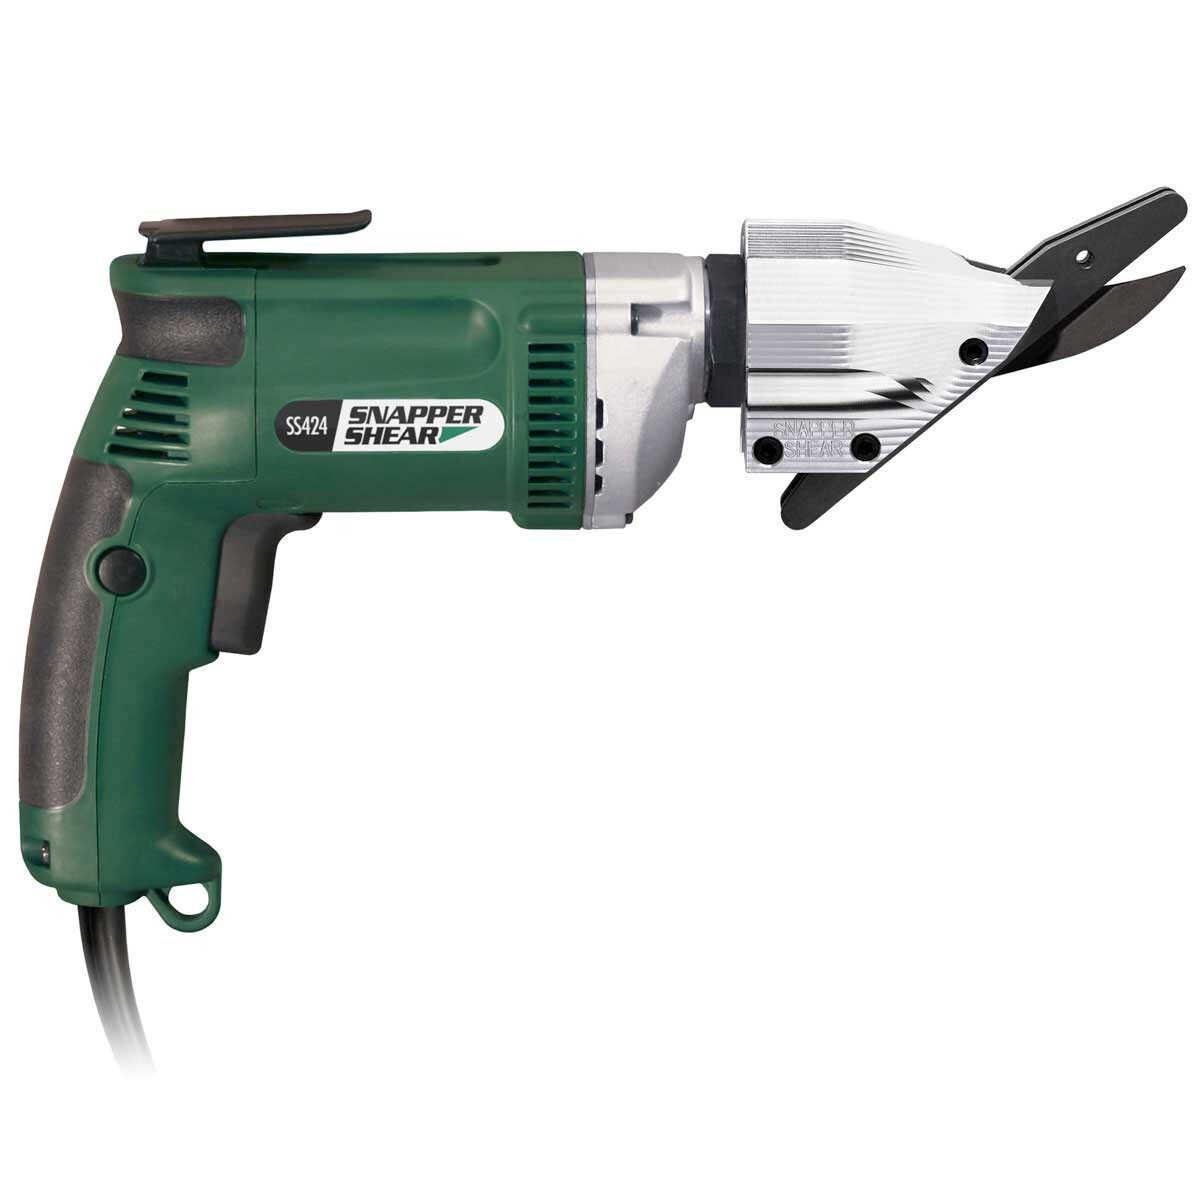 SS424 Razorbacker Snapper Shear fiber cement dustless cutting